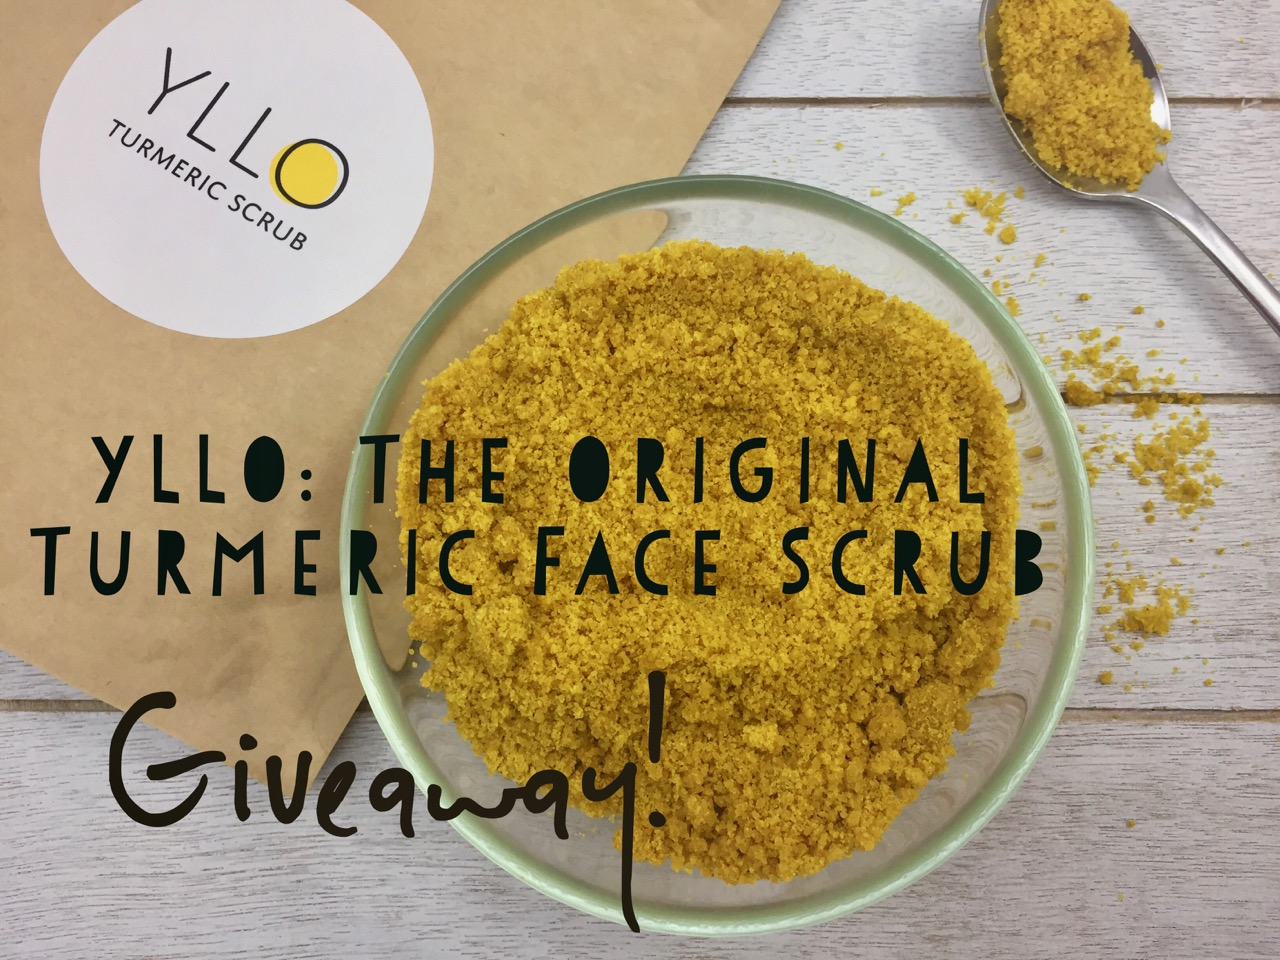 YLLO: The Original Turmeric Face Scrub (Giveaway!)